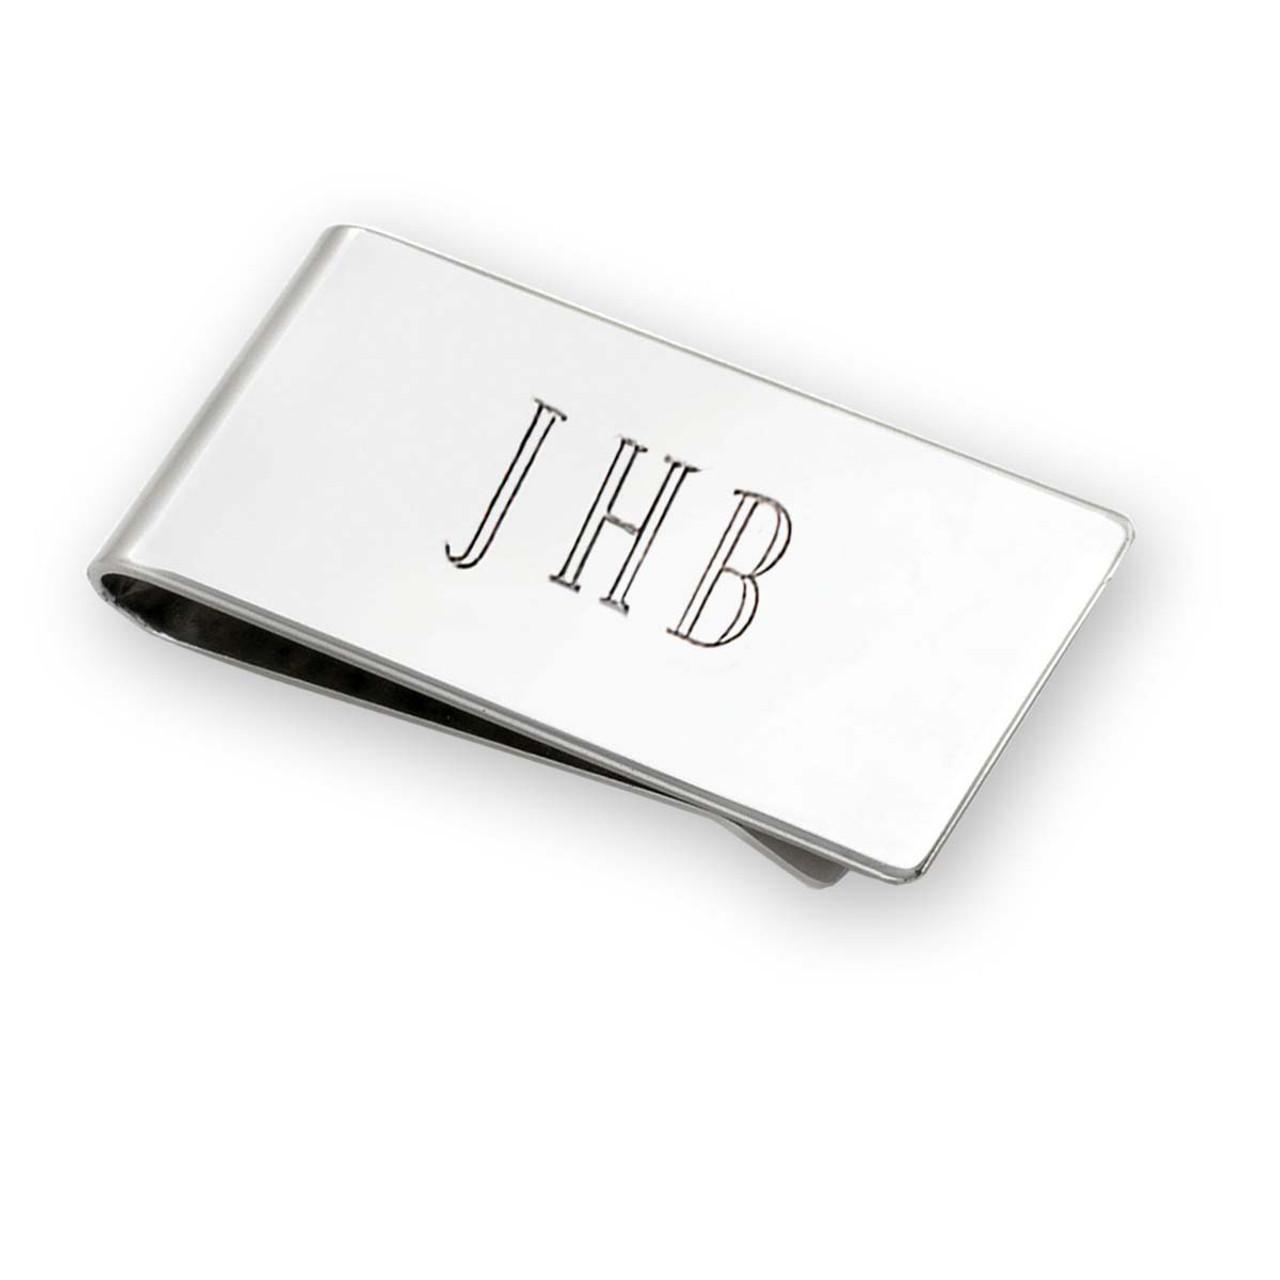 9c7ed9721c08 Buy Sterling Silver Money Clip For Men at Online Store